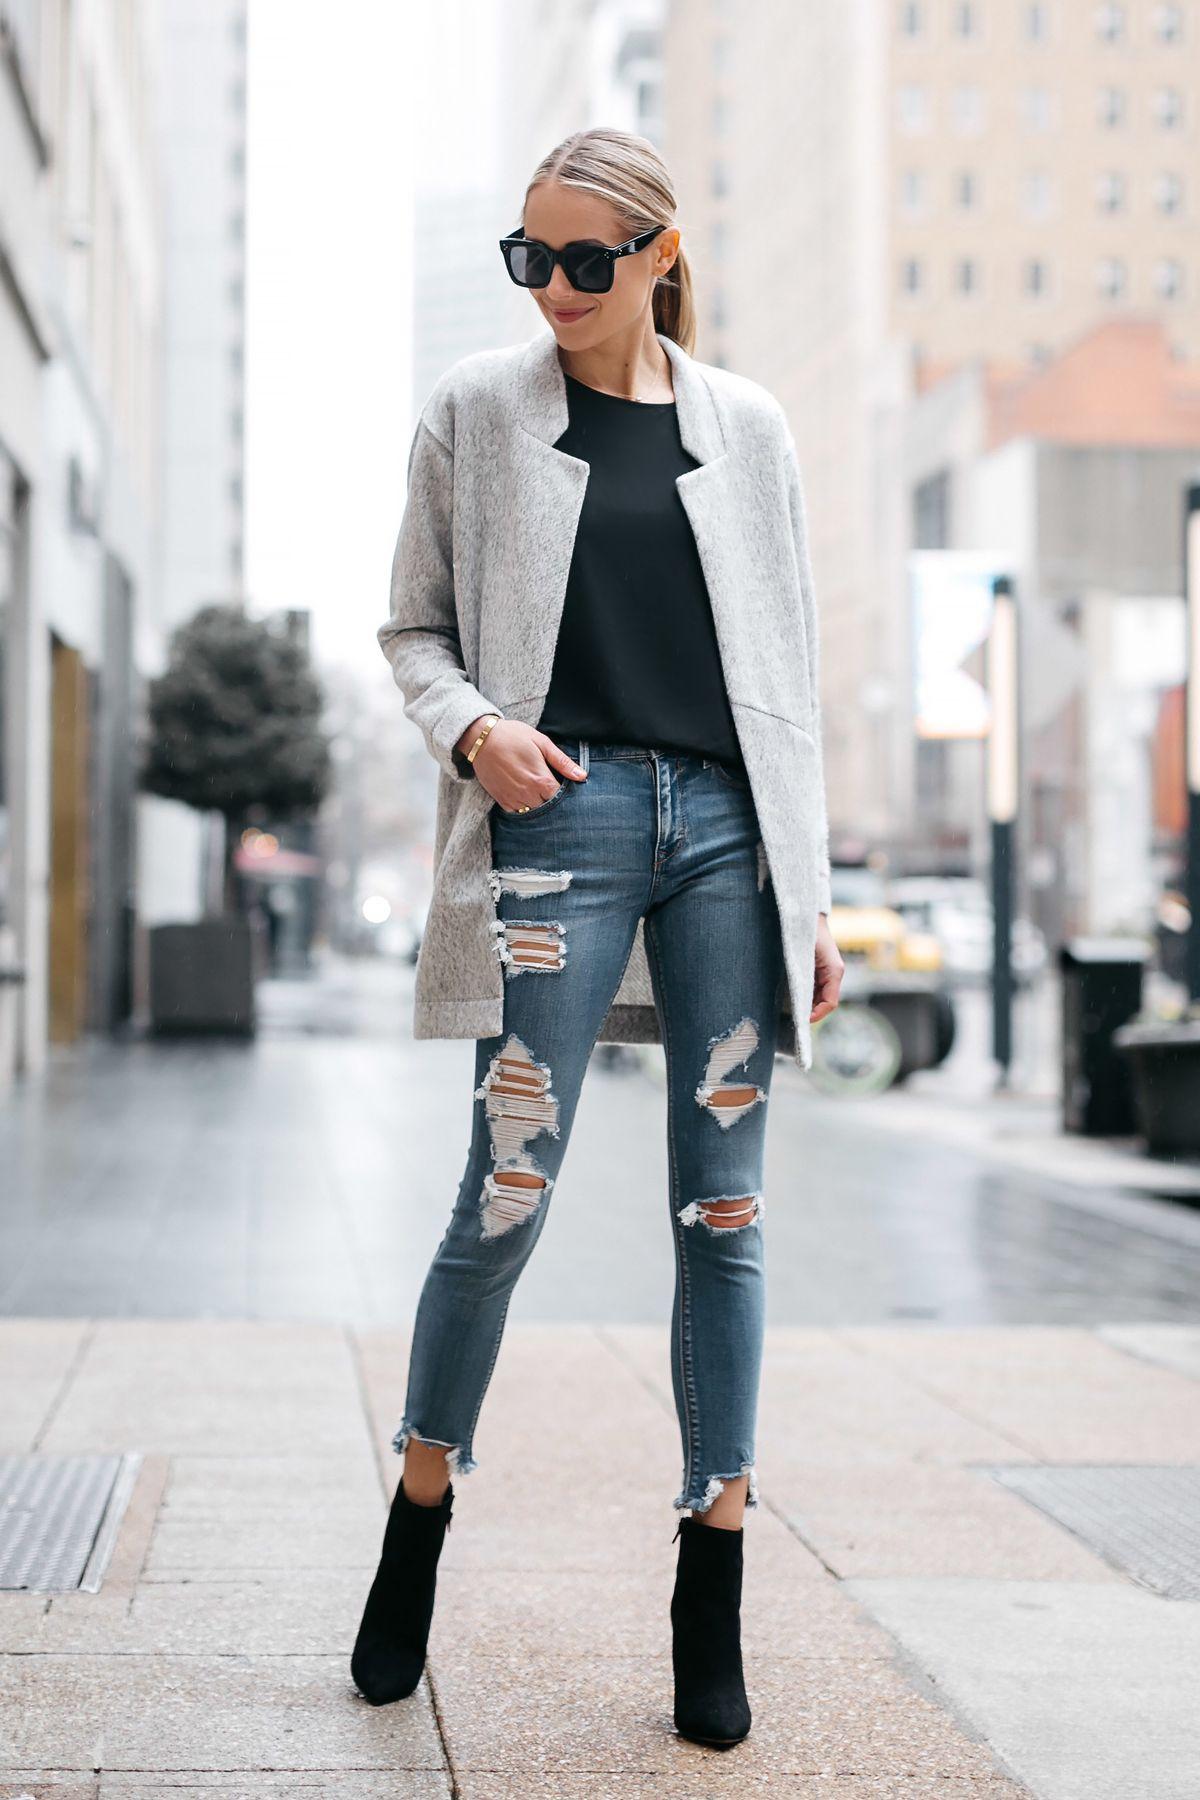 d7bc19fa4e53 Blonde Woman Wearing Express Grey Coat Denim Ripped Skinny Jeans Black  Booties Fashion Jackson Dallas Blogger Fashion Blogger Street Style